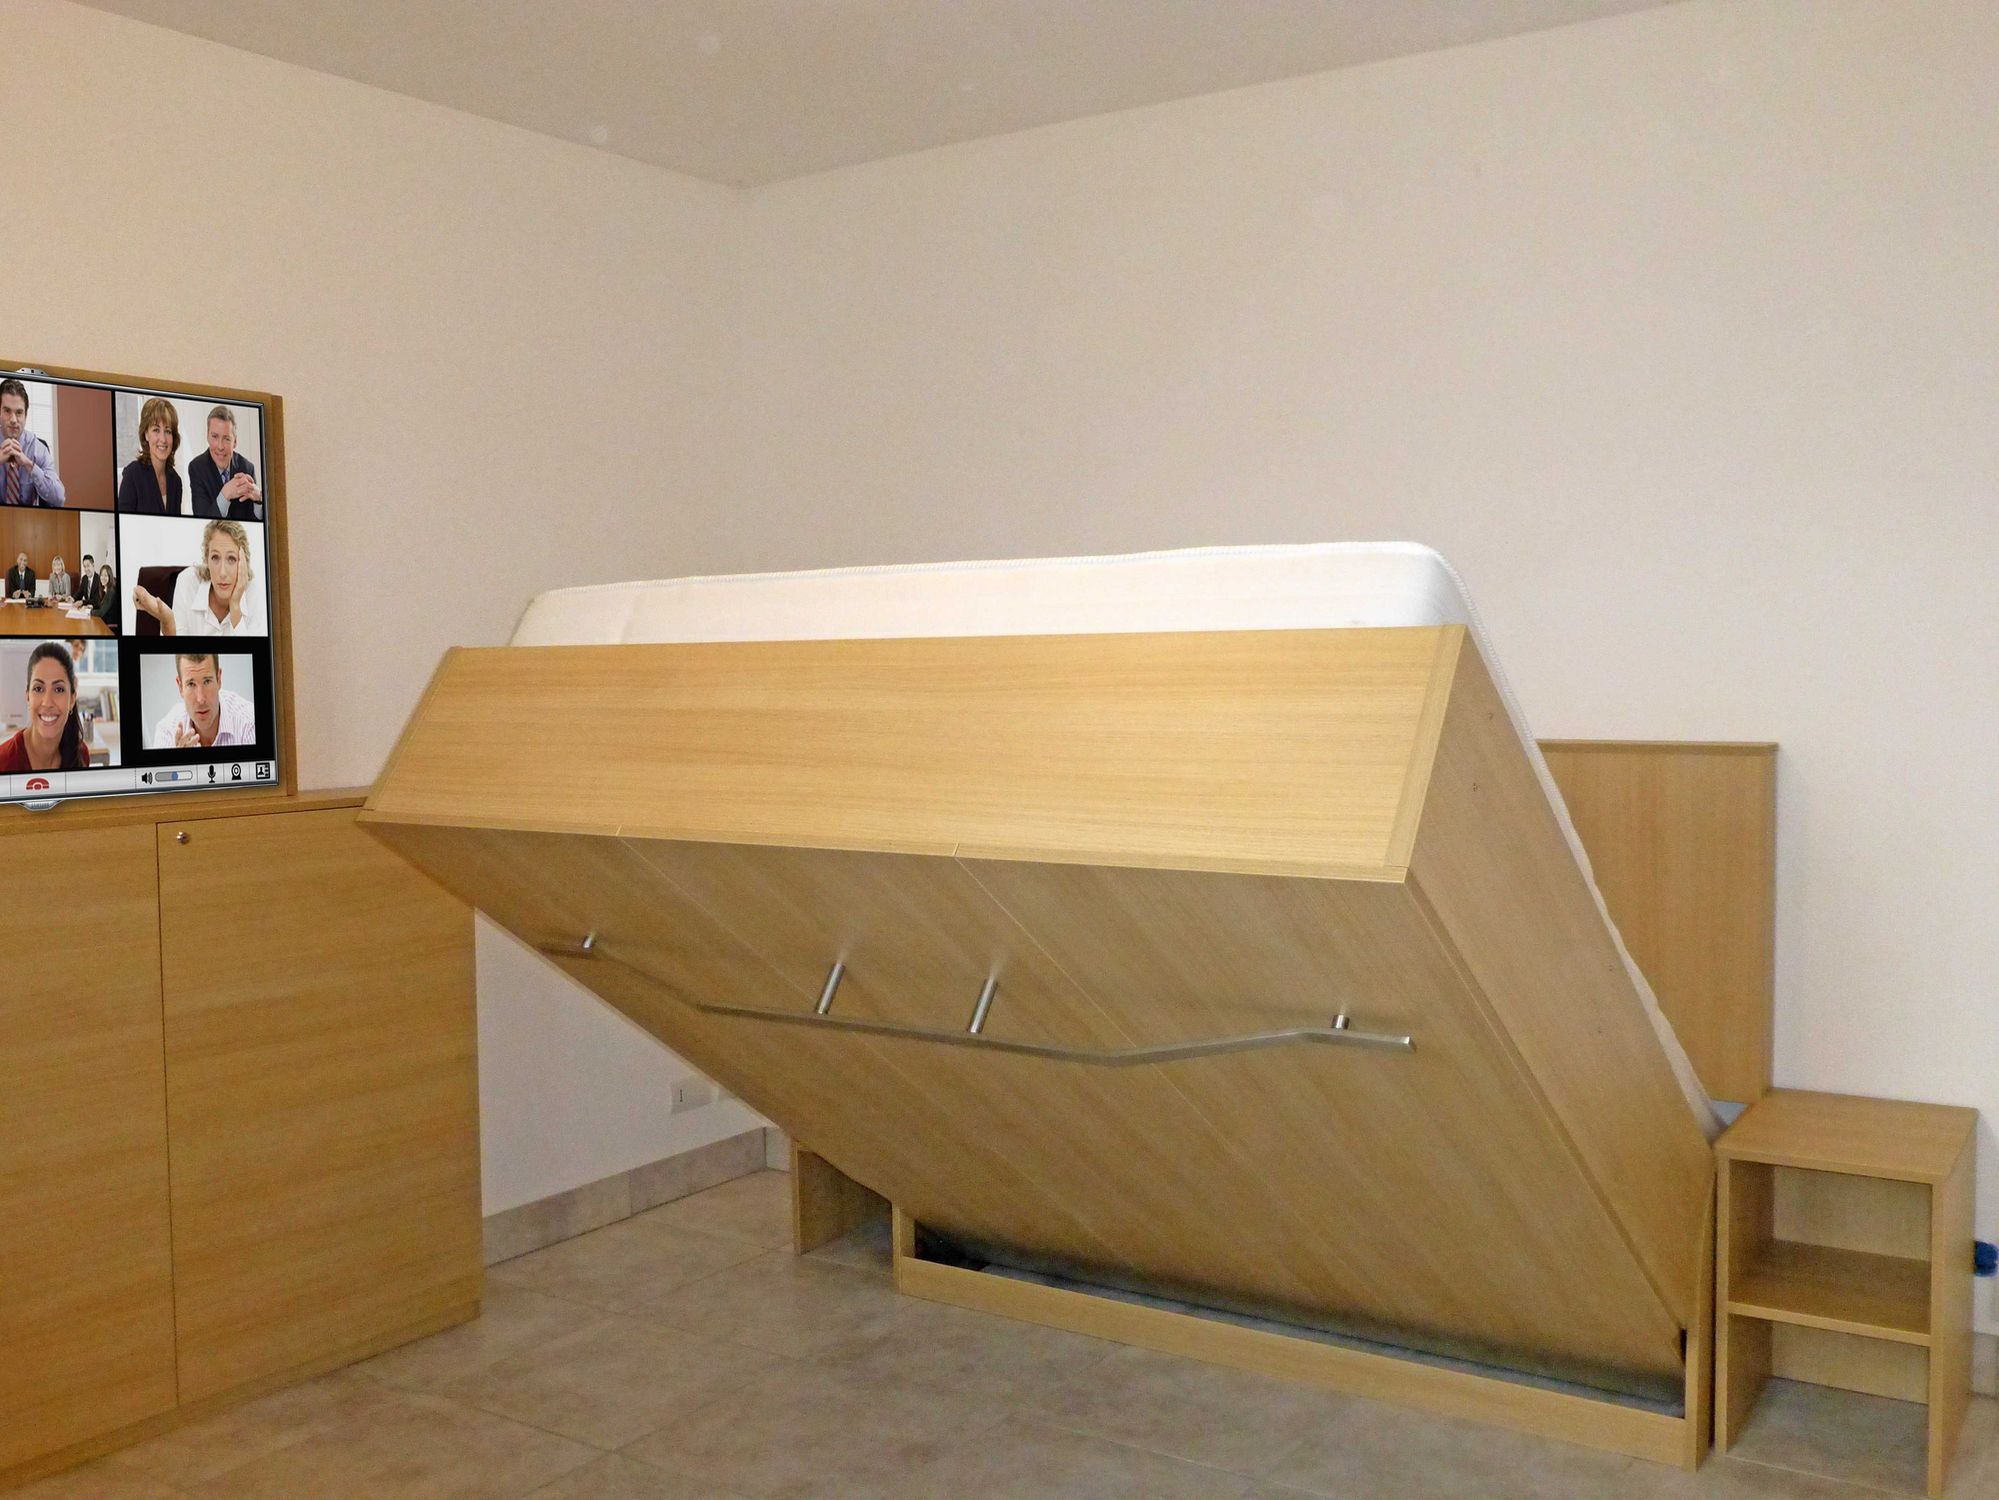 Wall Bed Manon Liftsecurity Double Contemporary Custom